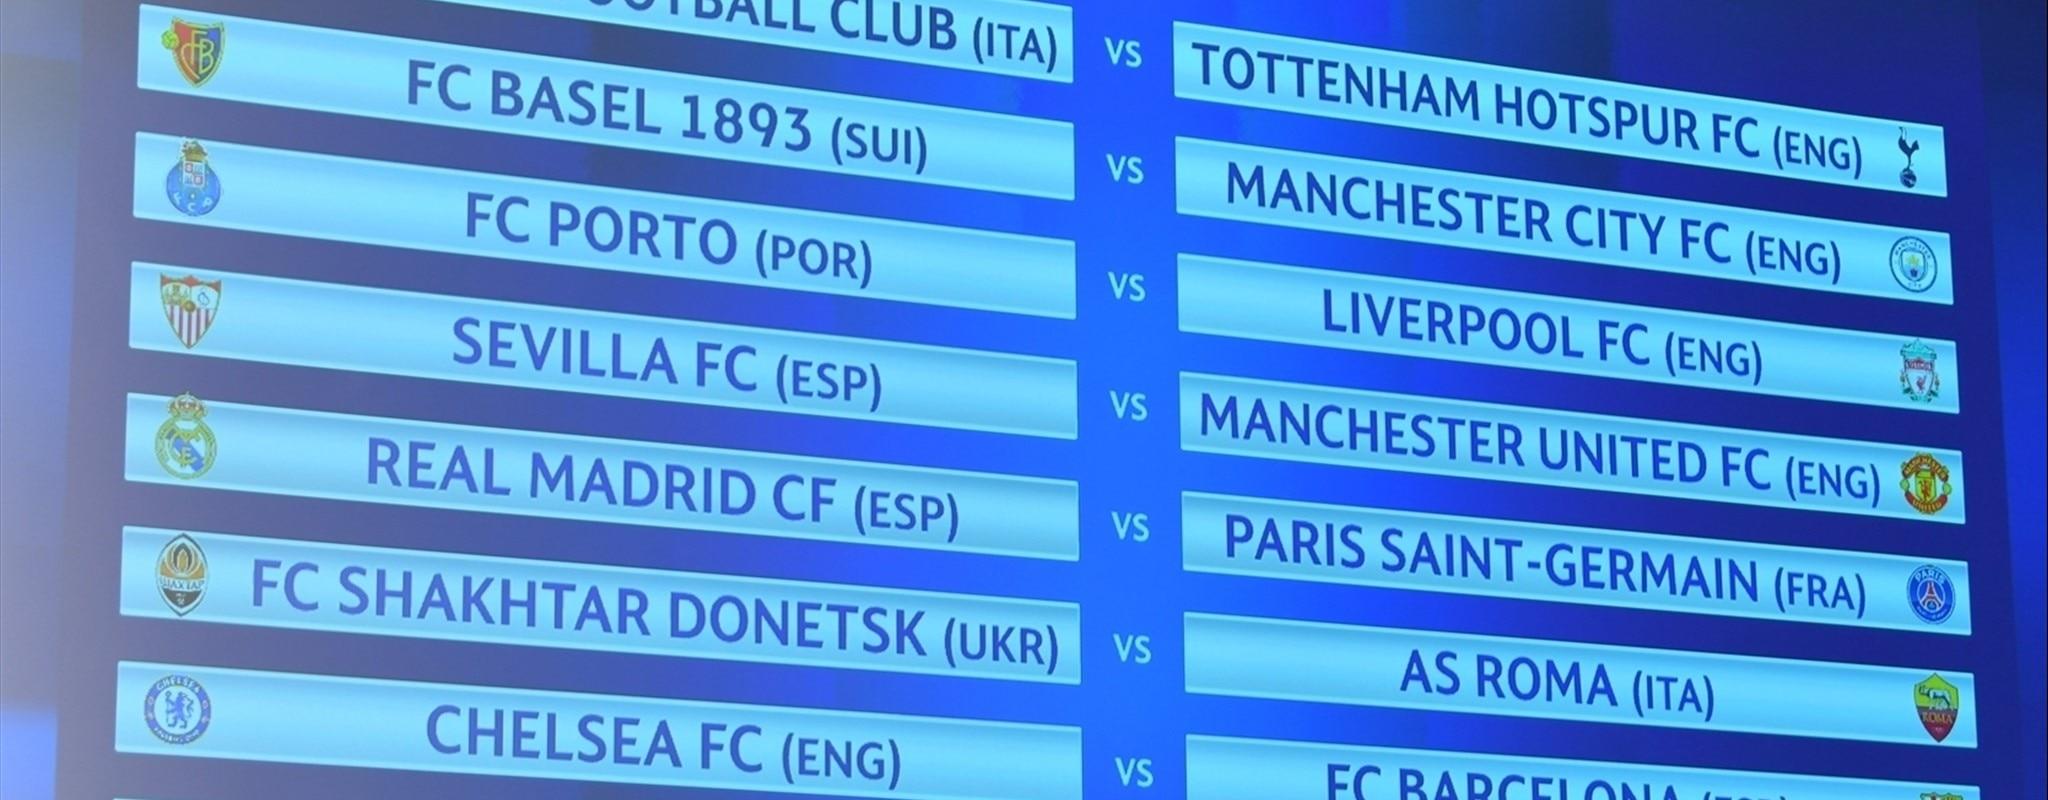 2526429 UltraWide CL: nas oitavas, Real Madrid X PSG. Castigaço!